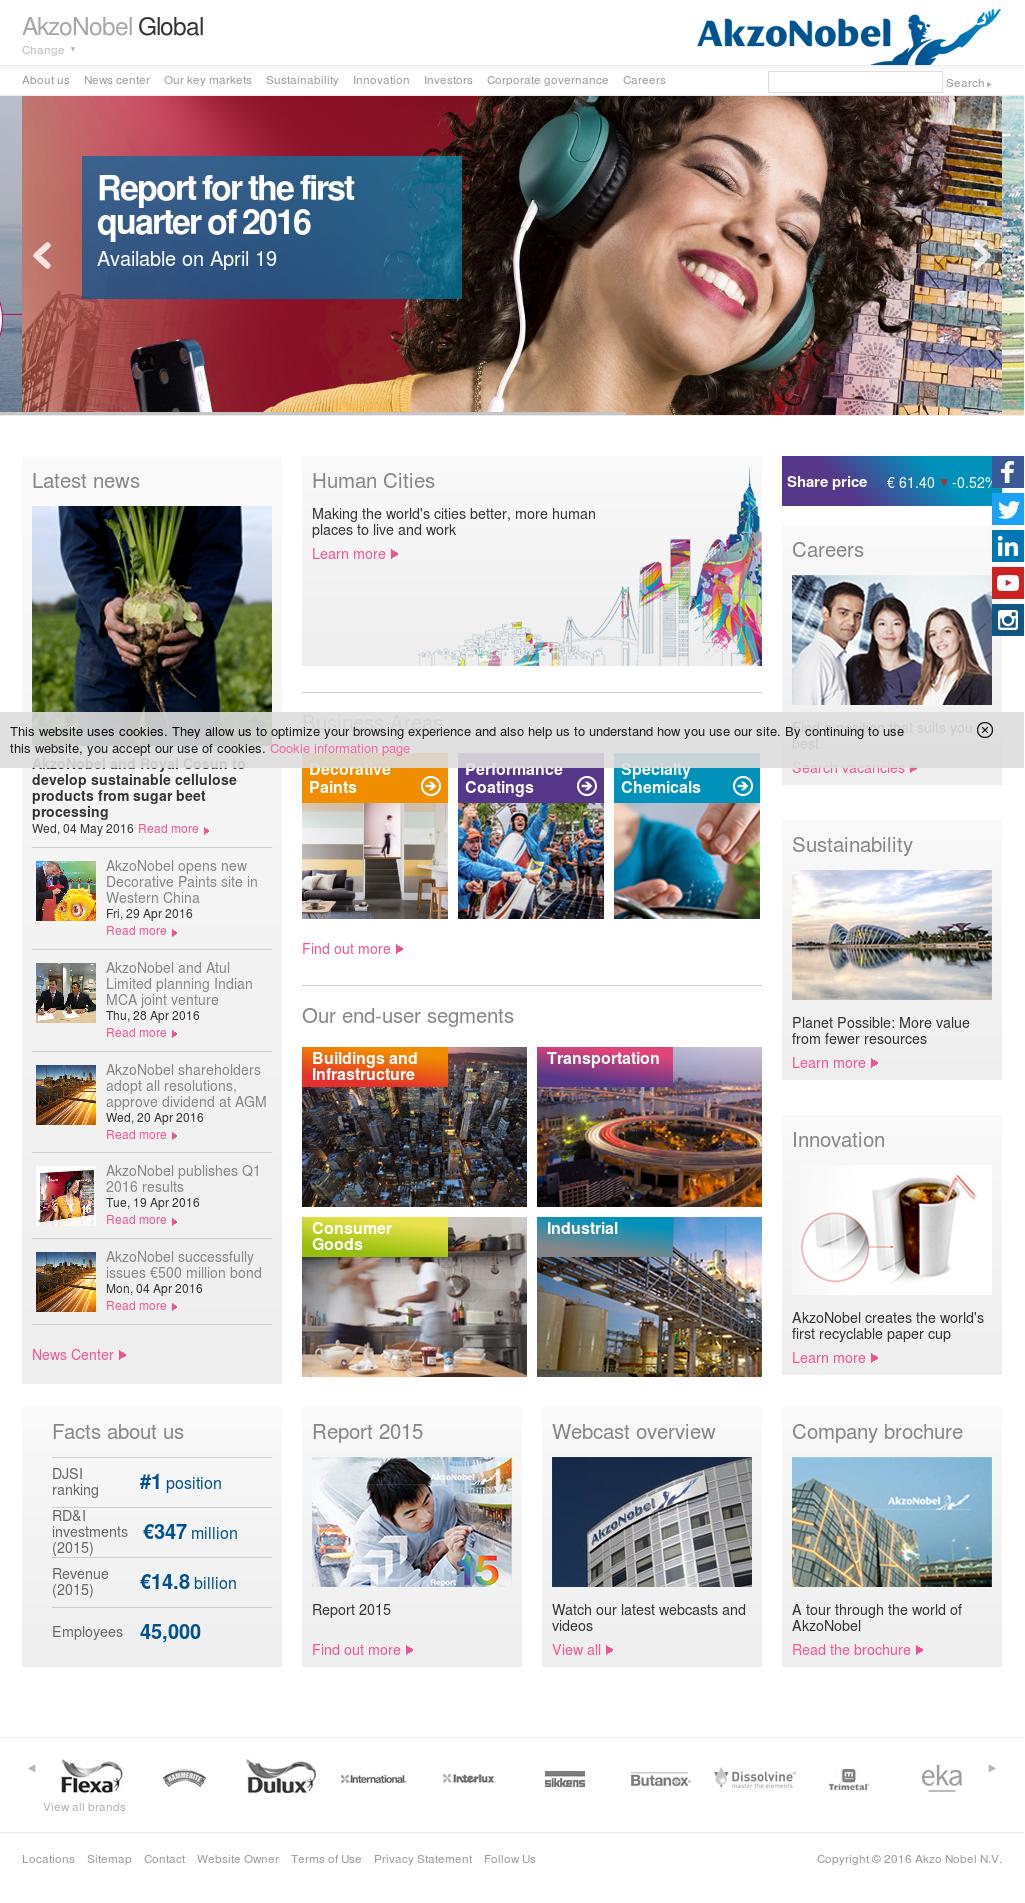 AkzoNobel Competitors, Revenue and Employees - Owler Company Profile